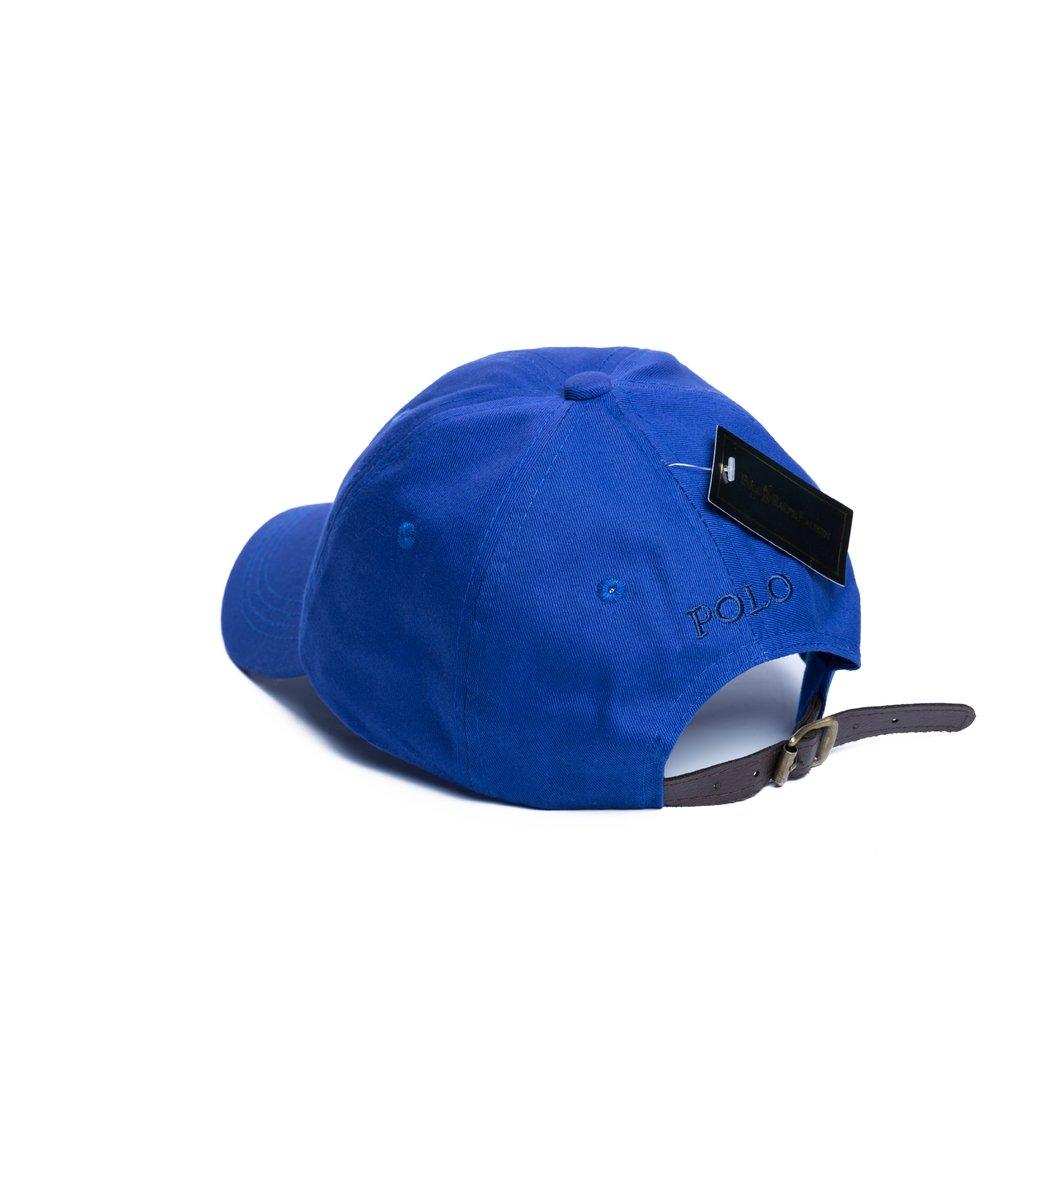 Кепка POLO Ralph Lauren Premiere Синий/синий